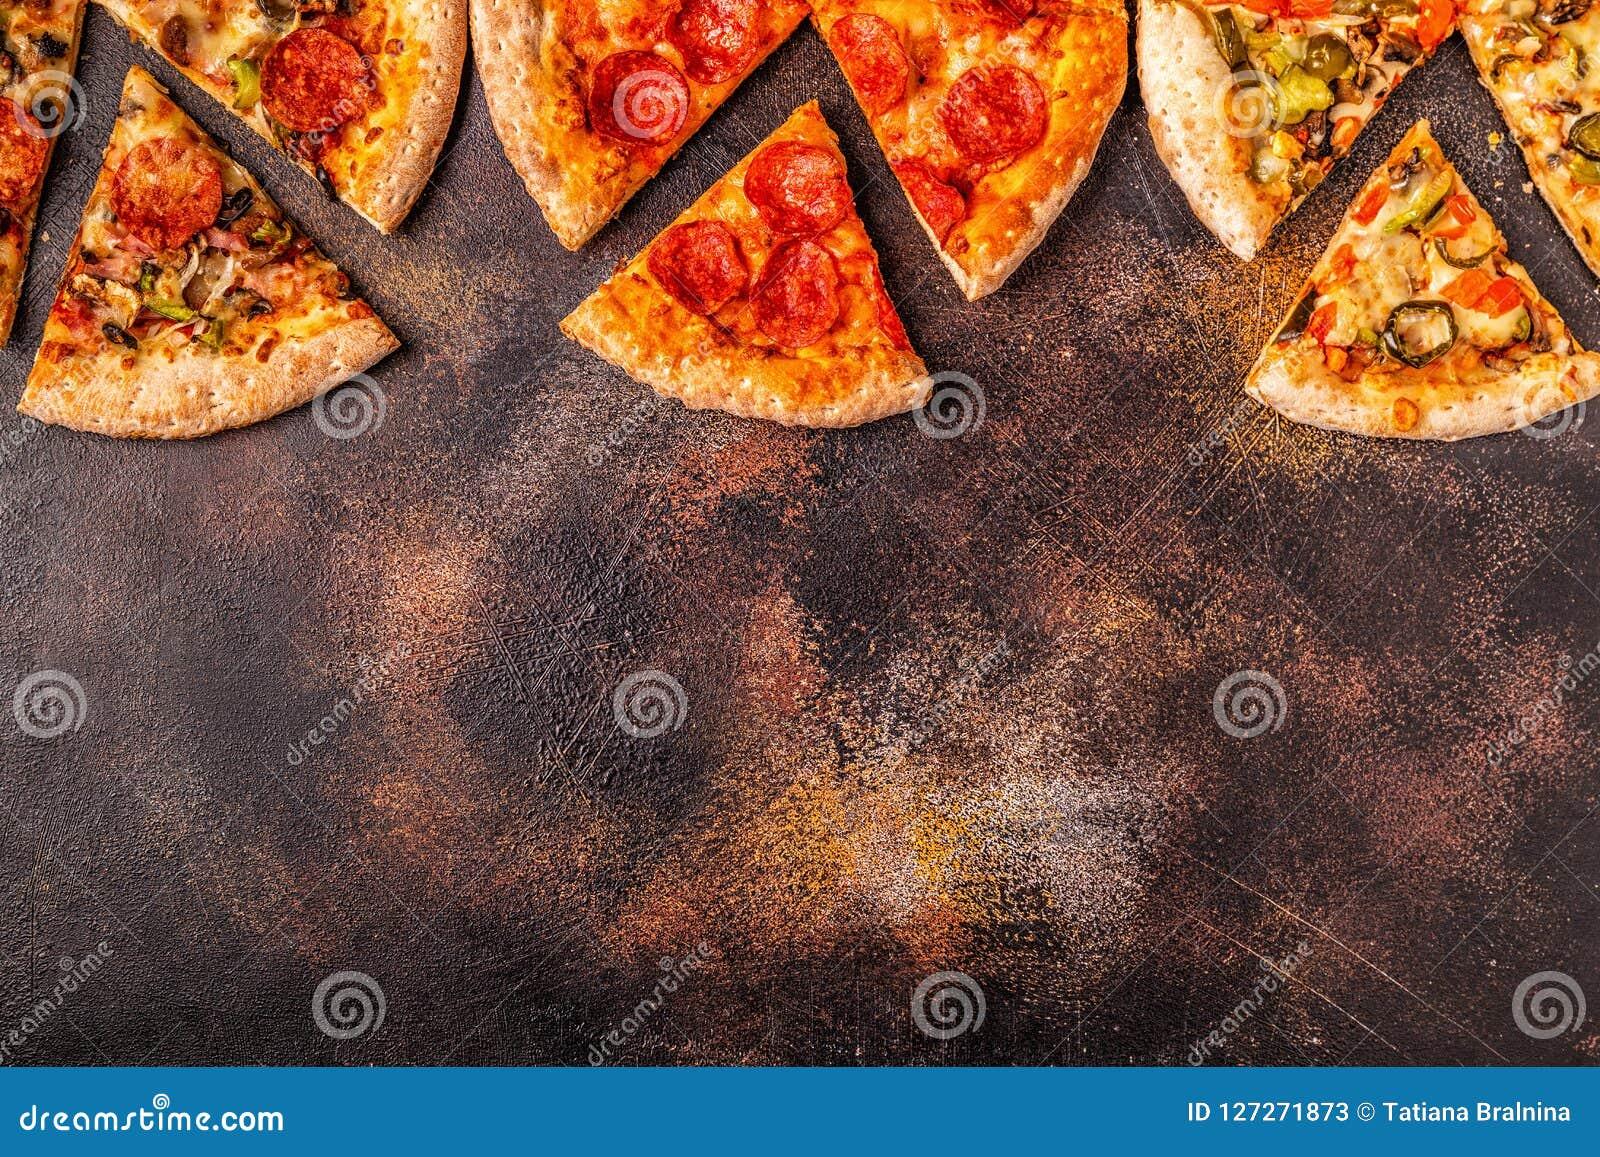 Insieme delle pizze differenti